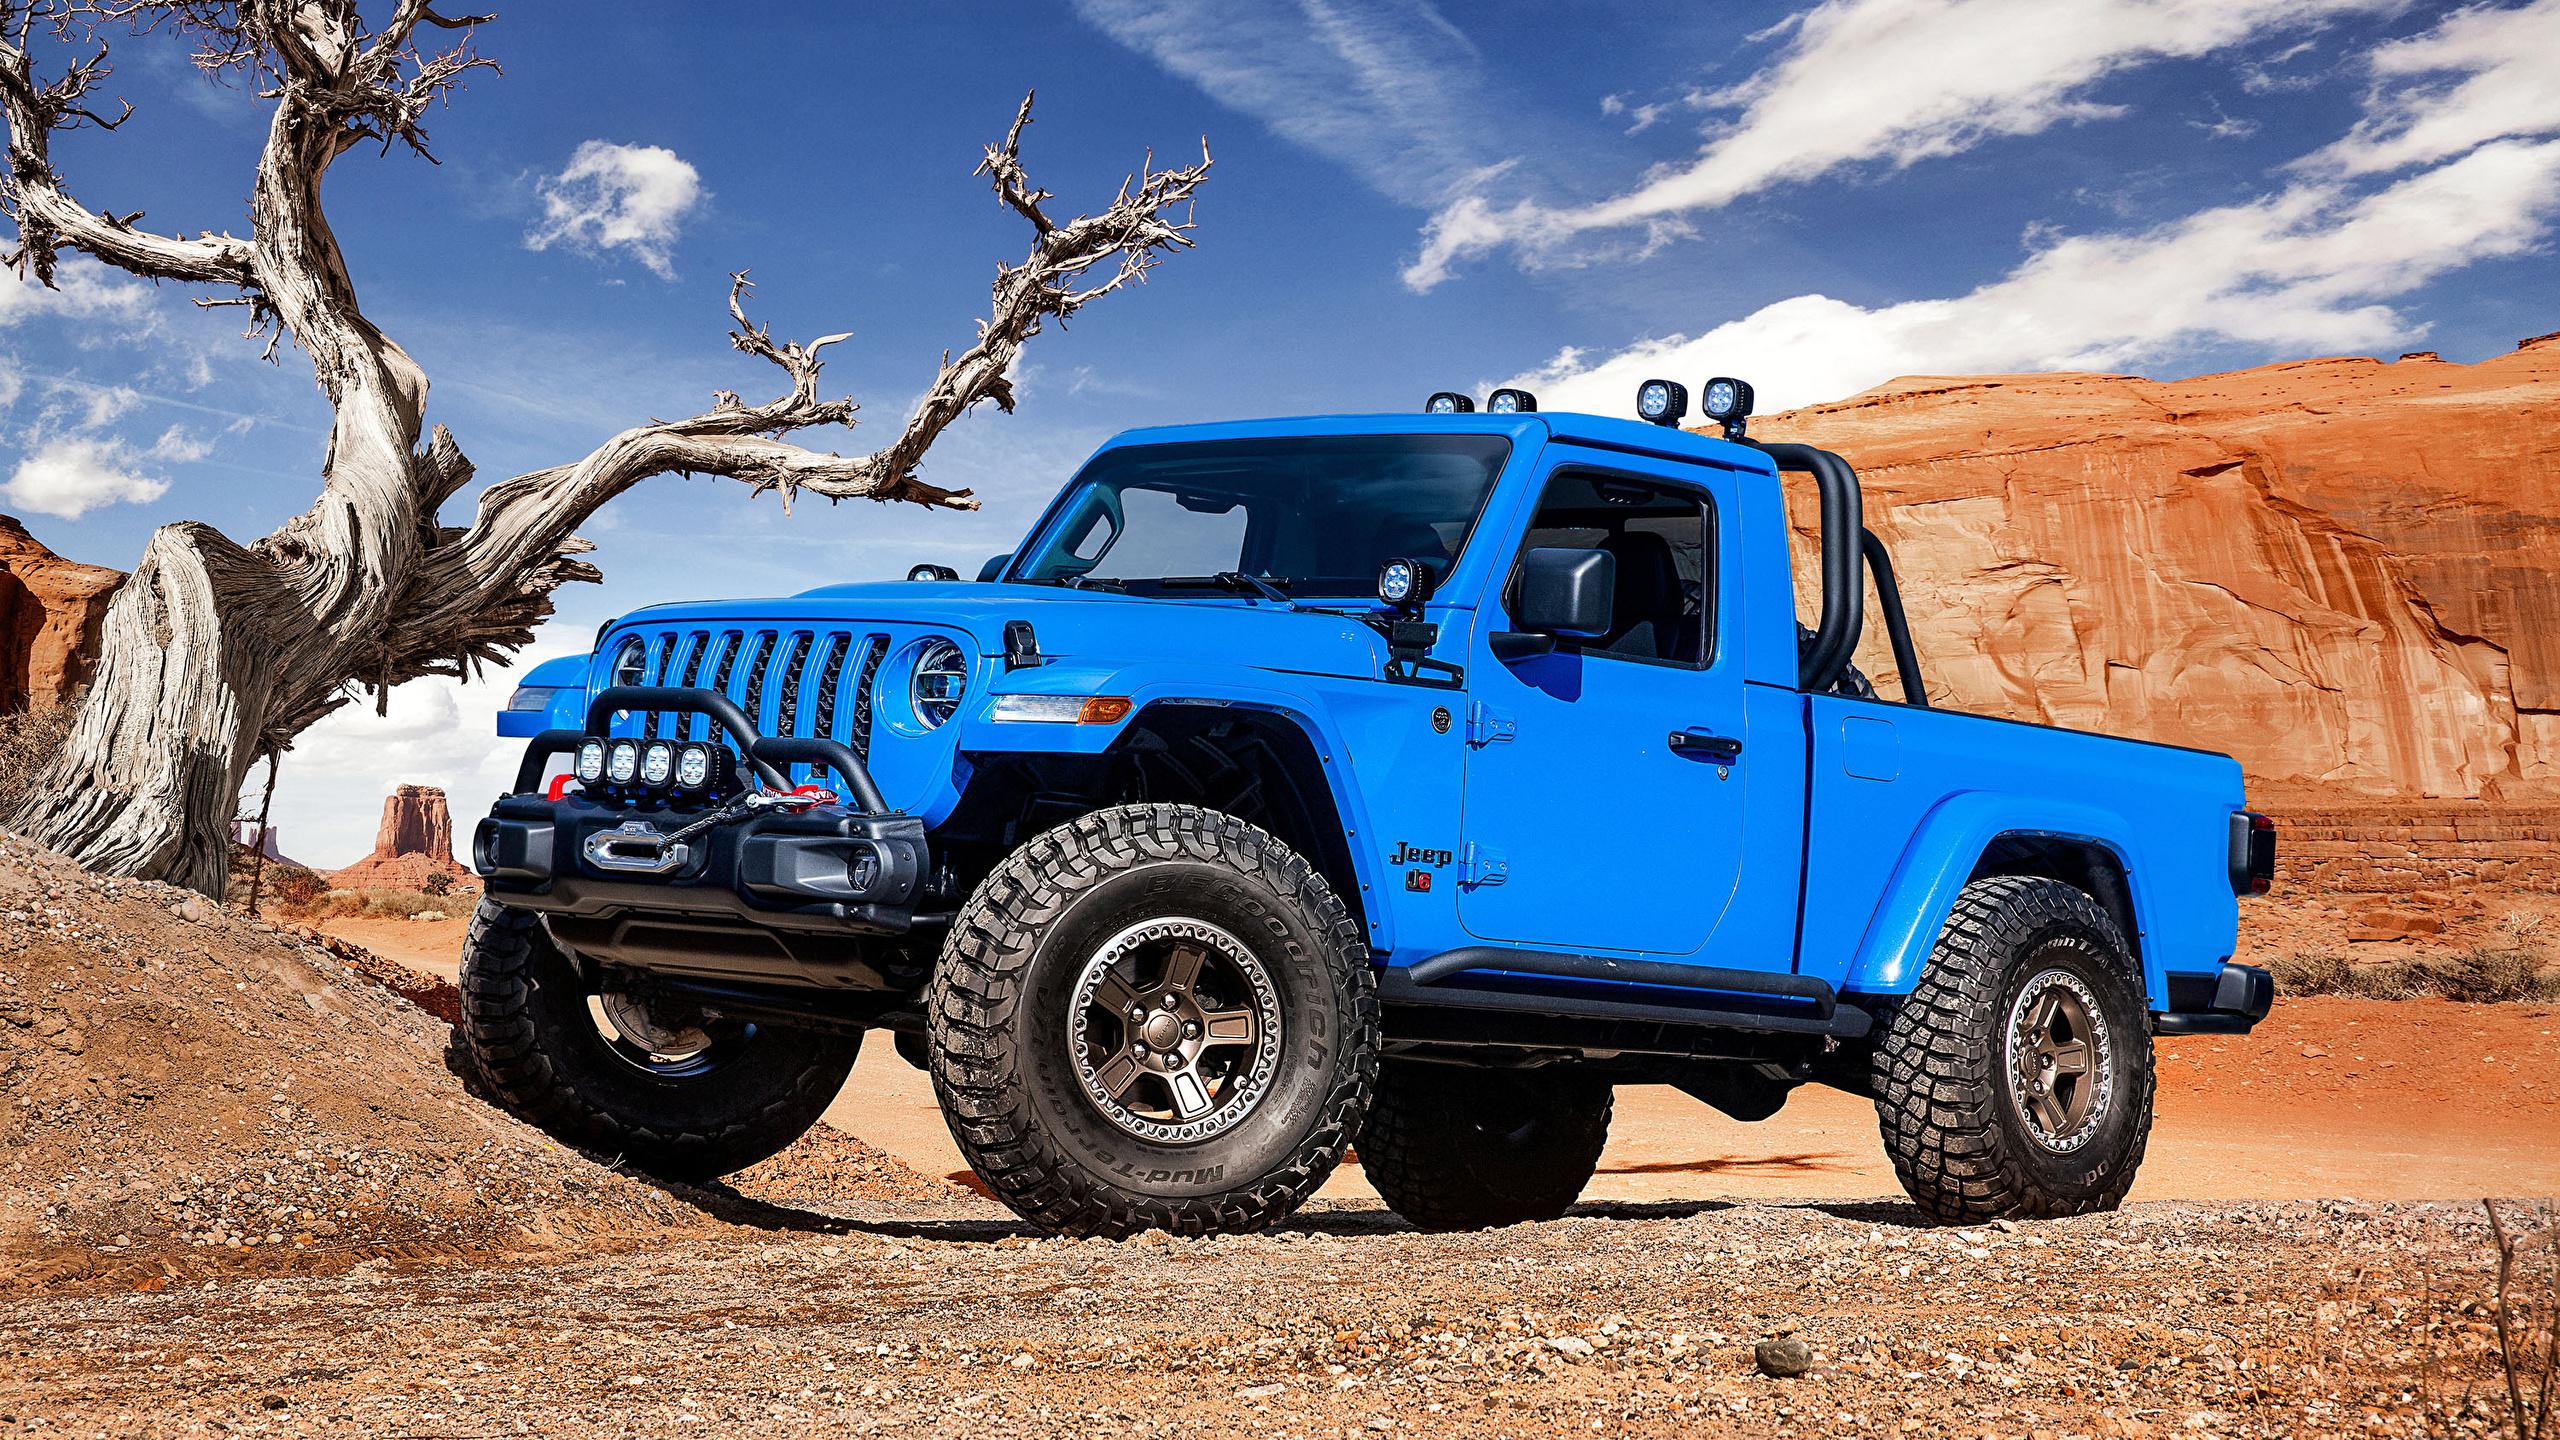 Картинки Джип 2019 J6 Пикап кузов Голубой Автомобили 2560x1440 Jeep голубых голубые голубая авто машина машины автомобиль